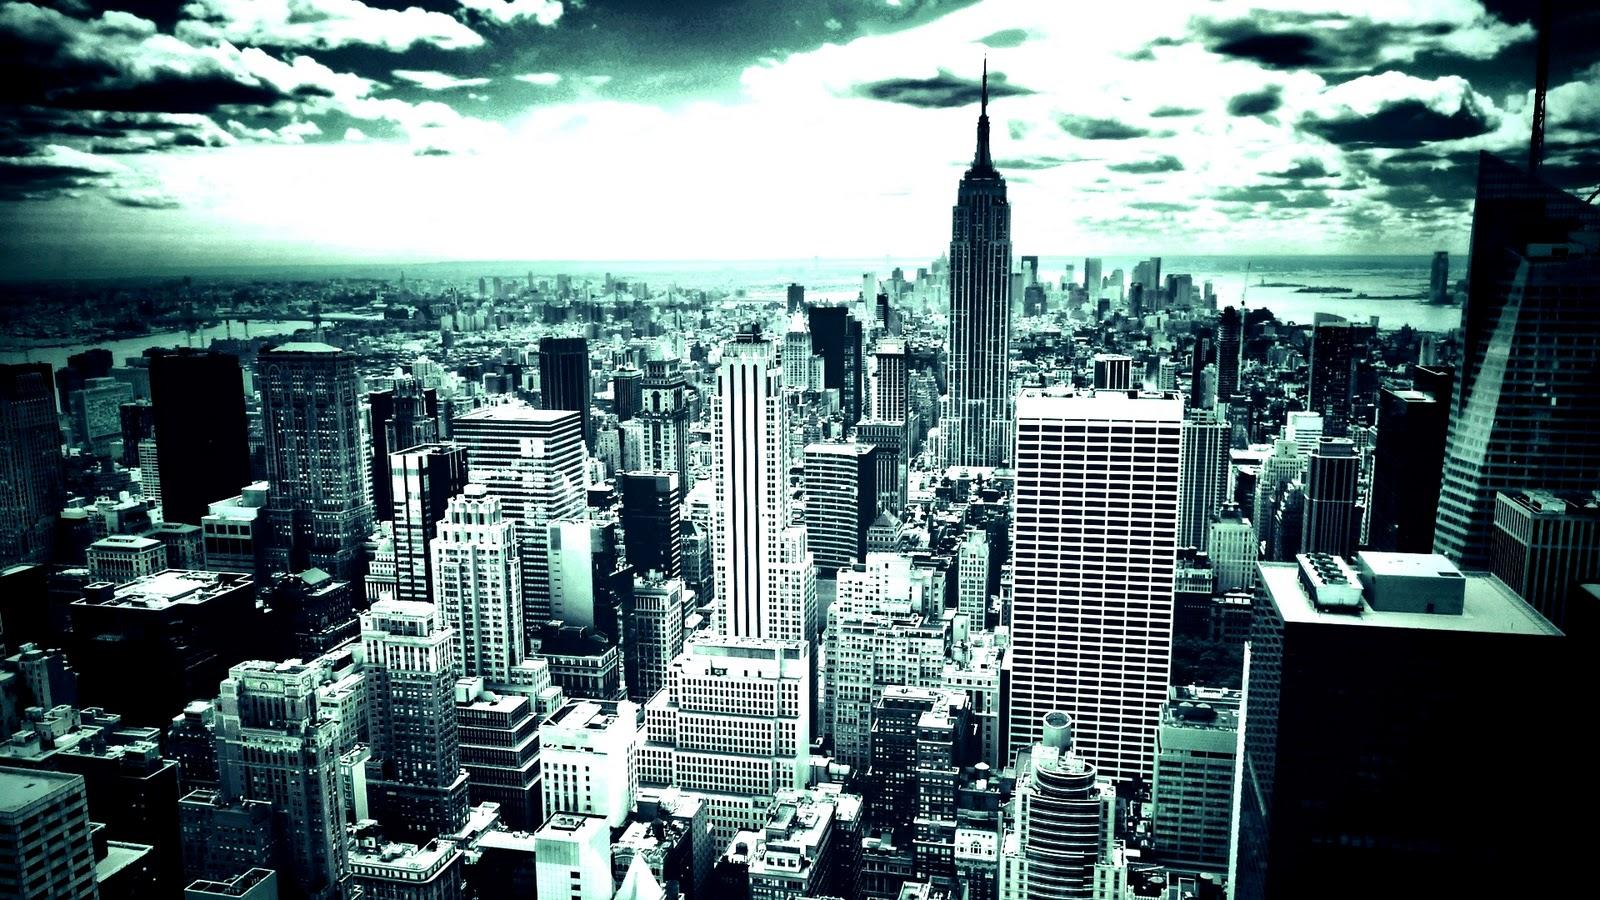 http://3.bp.blogspot.com/-BYLBgqNgL_g/Txl7T3UhUII/AAAAAAAAENU/U7mcjtvuc3g/s1600/new-york-wallpaper-3.jpg